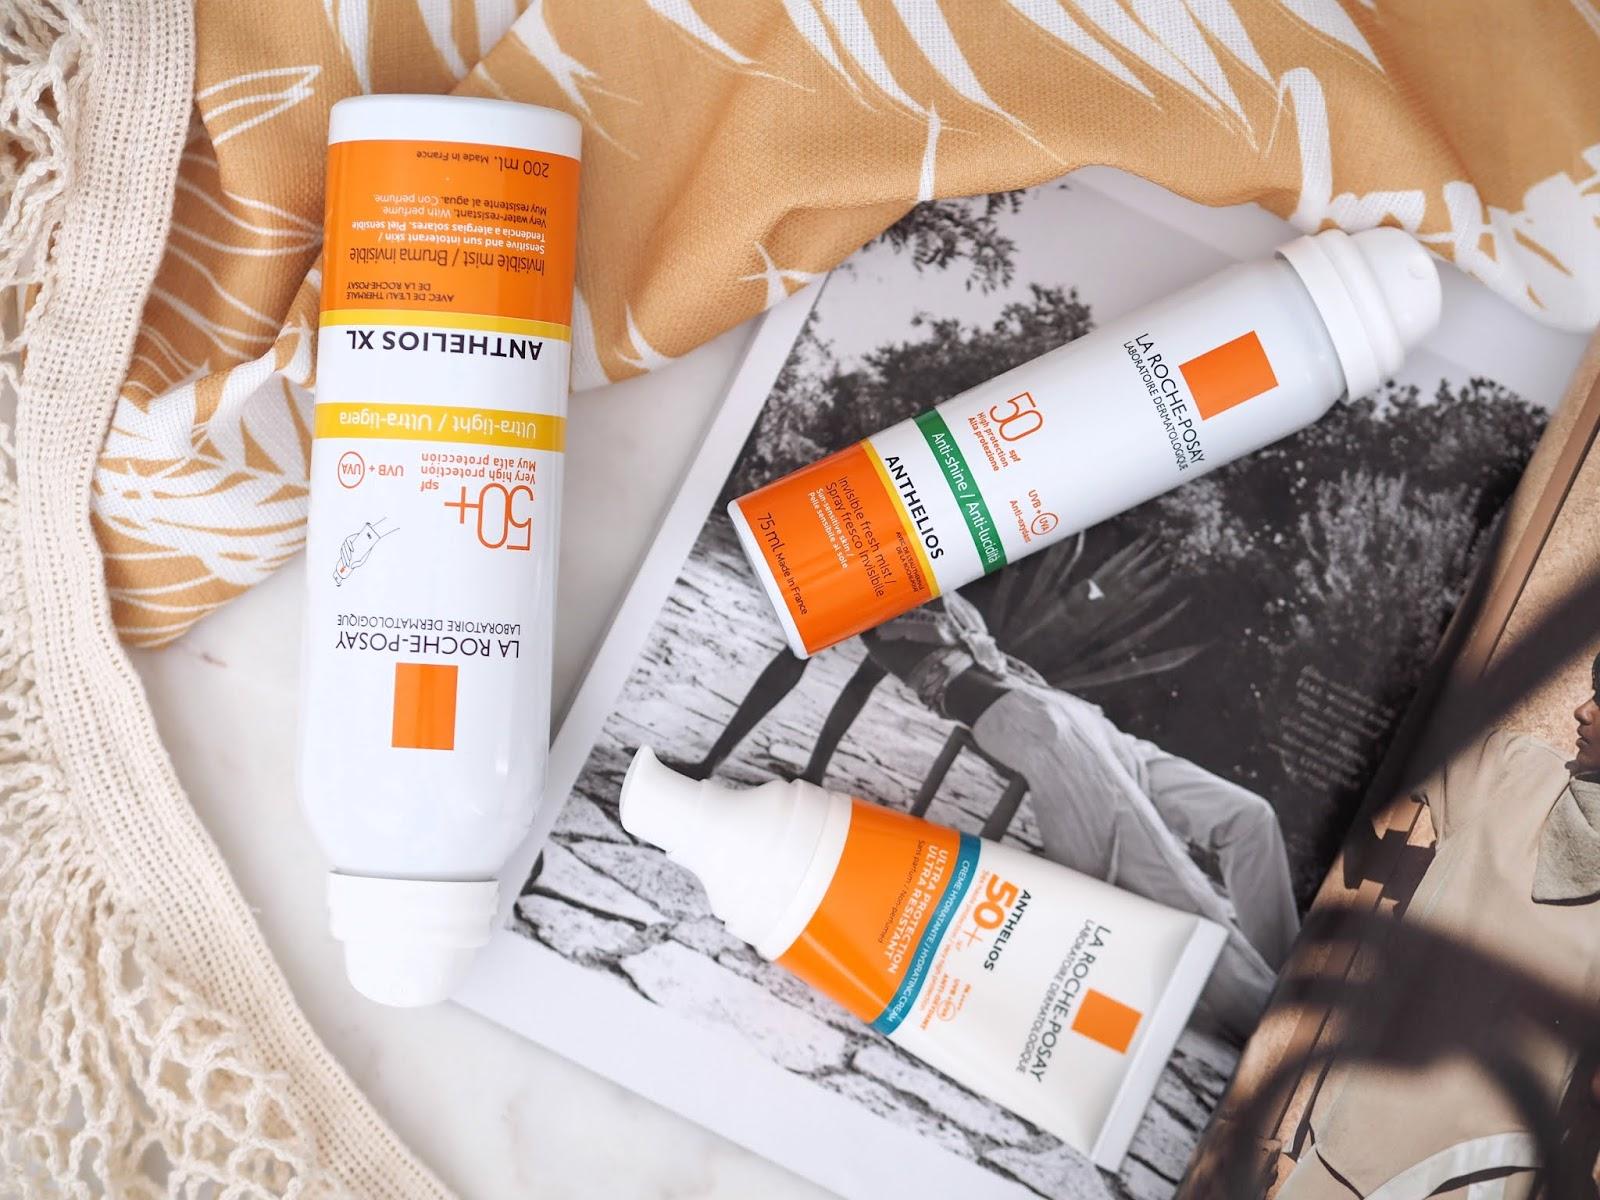 La Roche-Posay Anthelios SPF 50, slnečná kozmetika, vysoká slnečná ochrana, citlivá pokožka, slnečná alergia